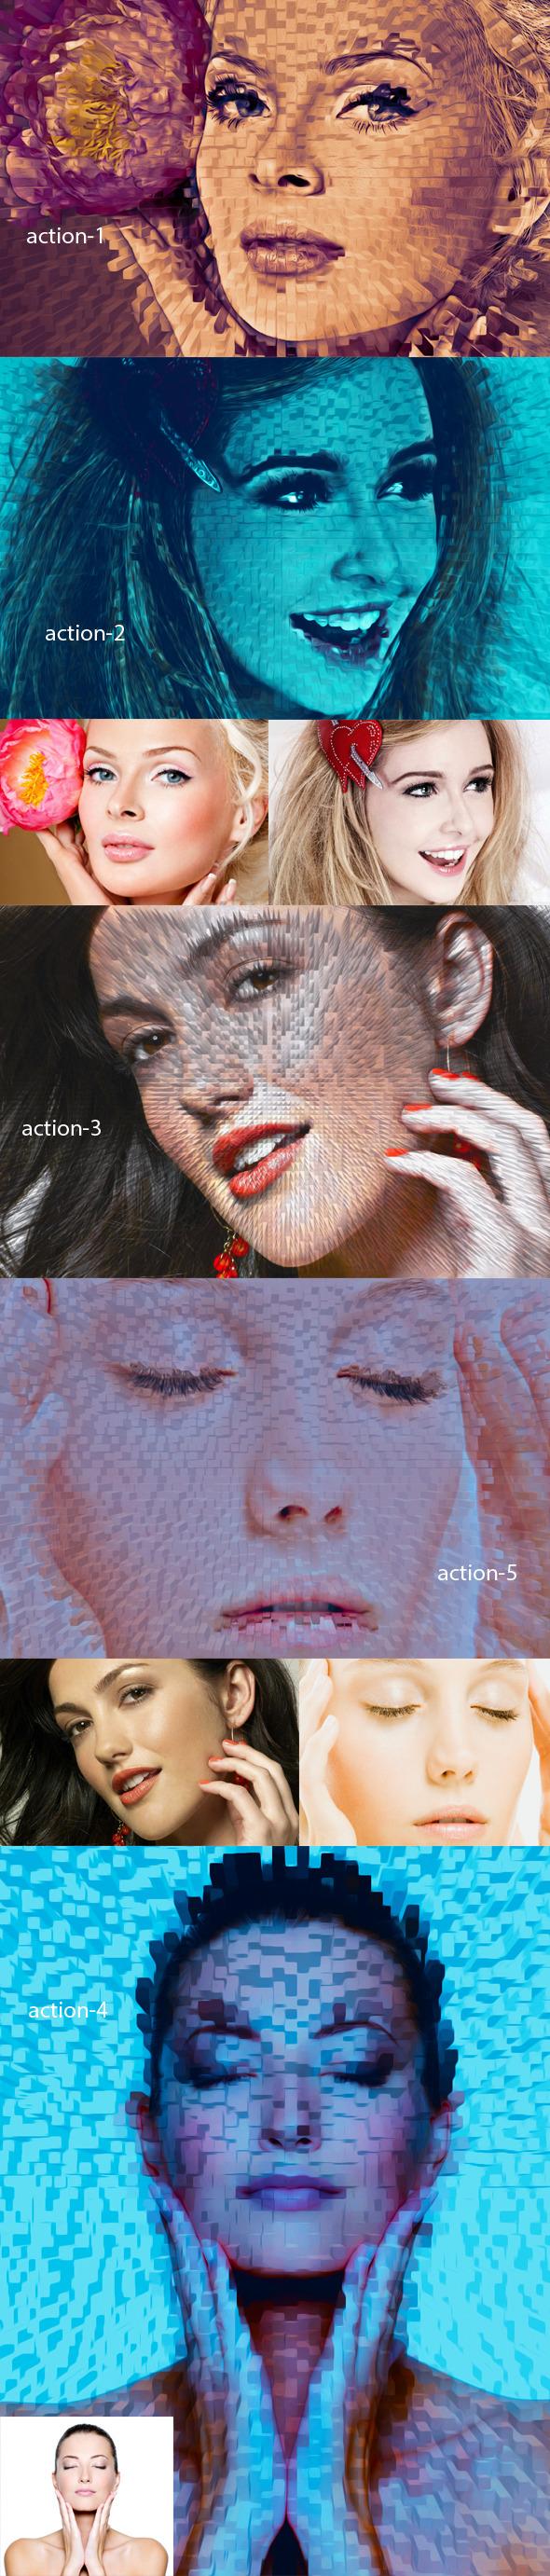 GraphicRiver Pixel Art Action 10031538